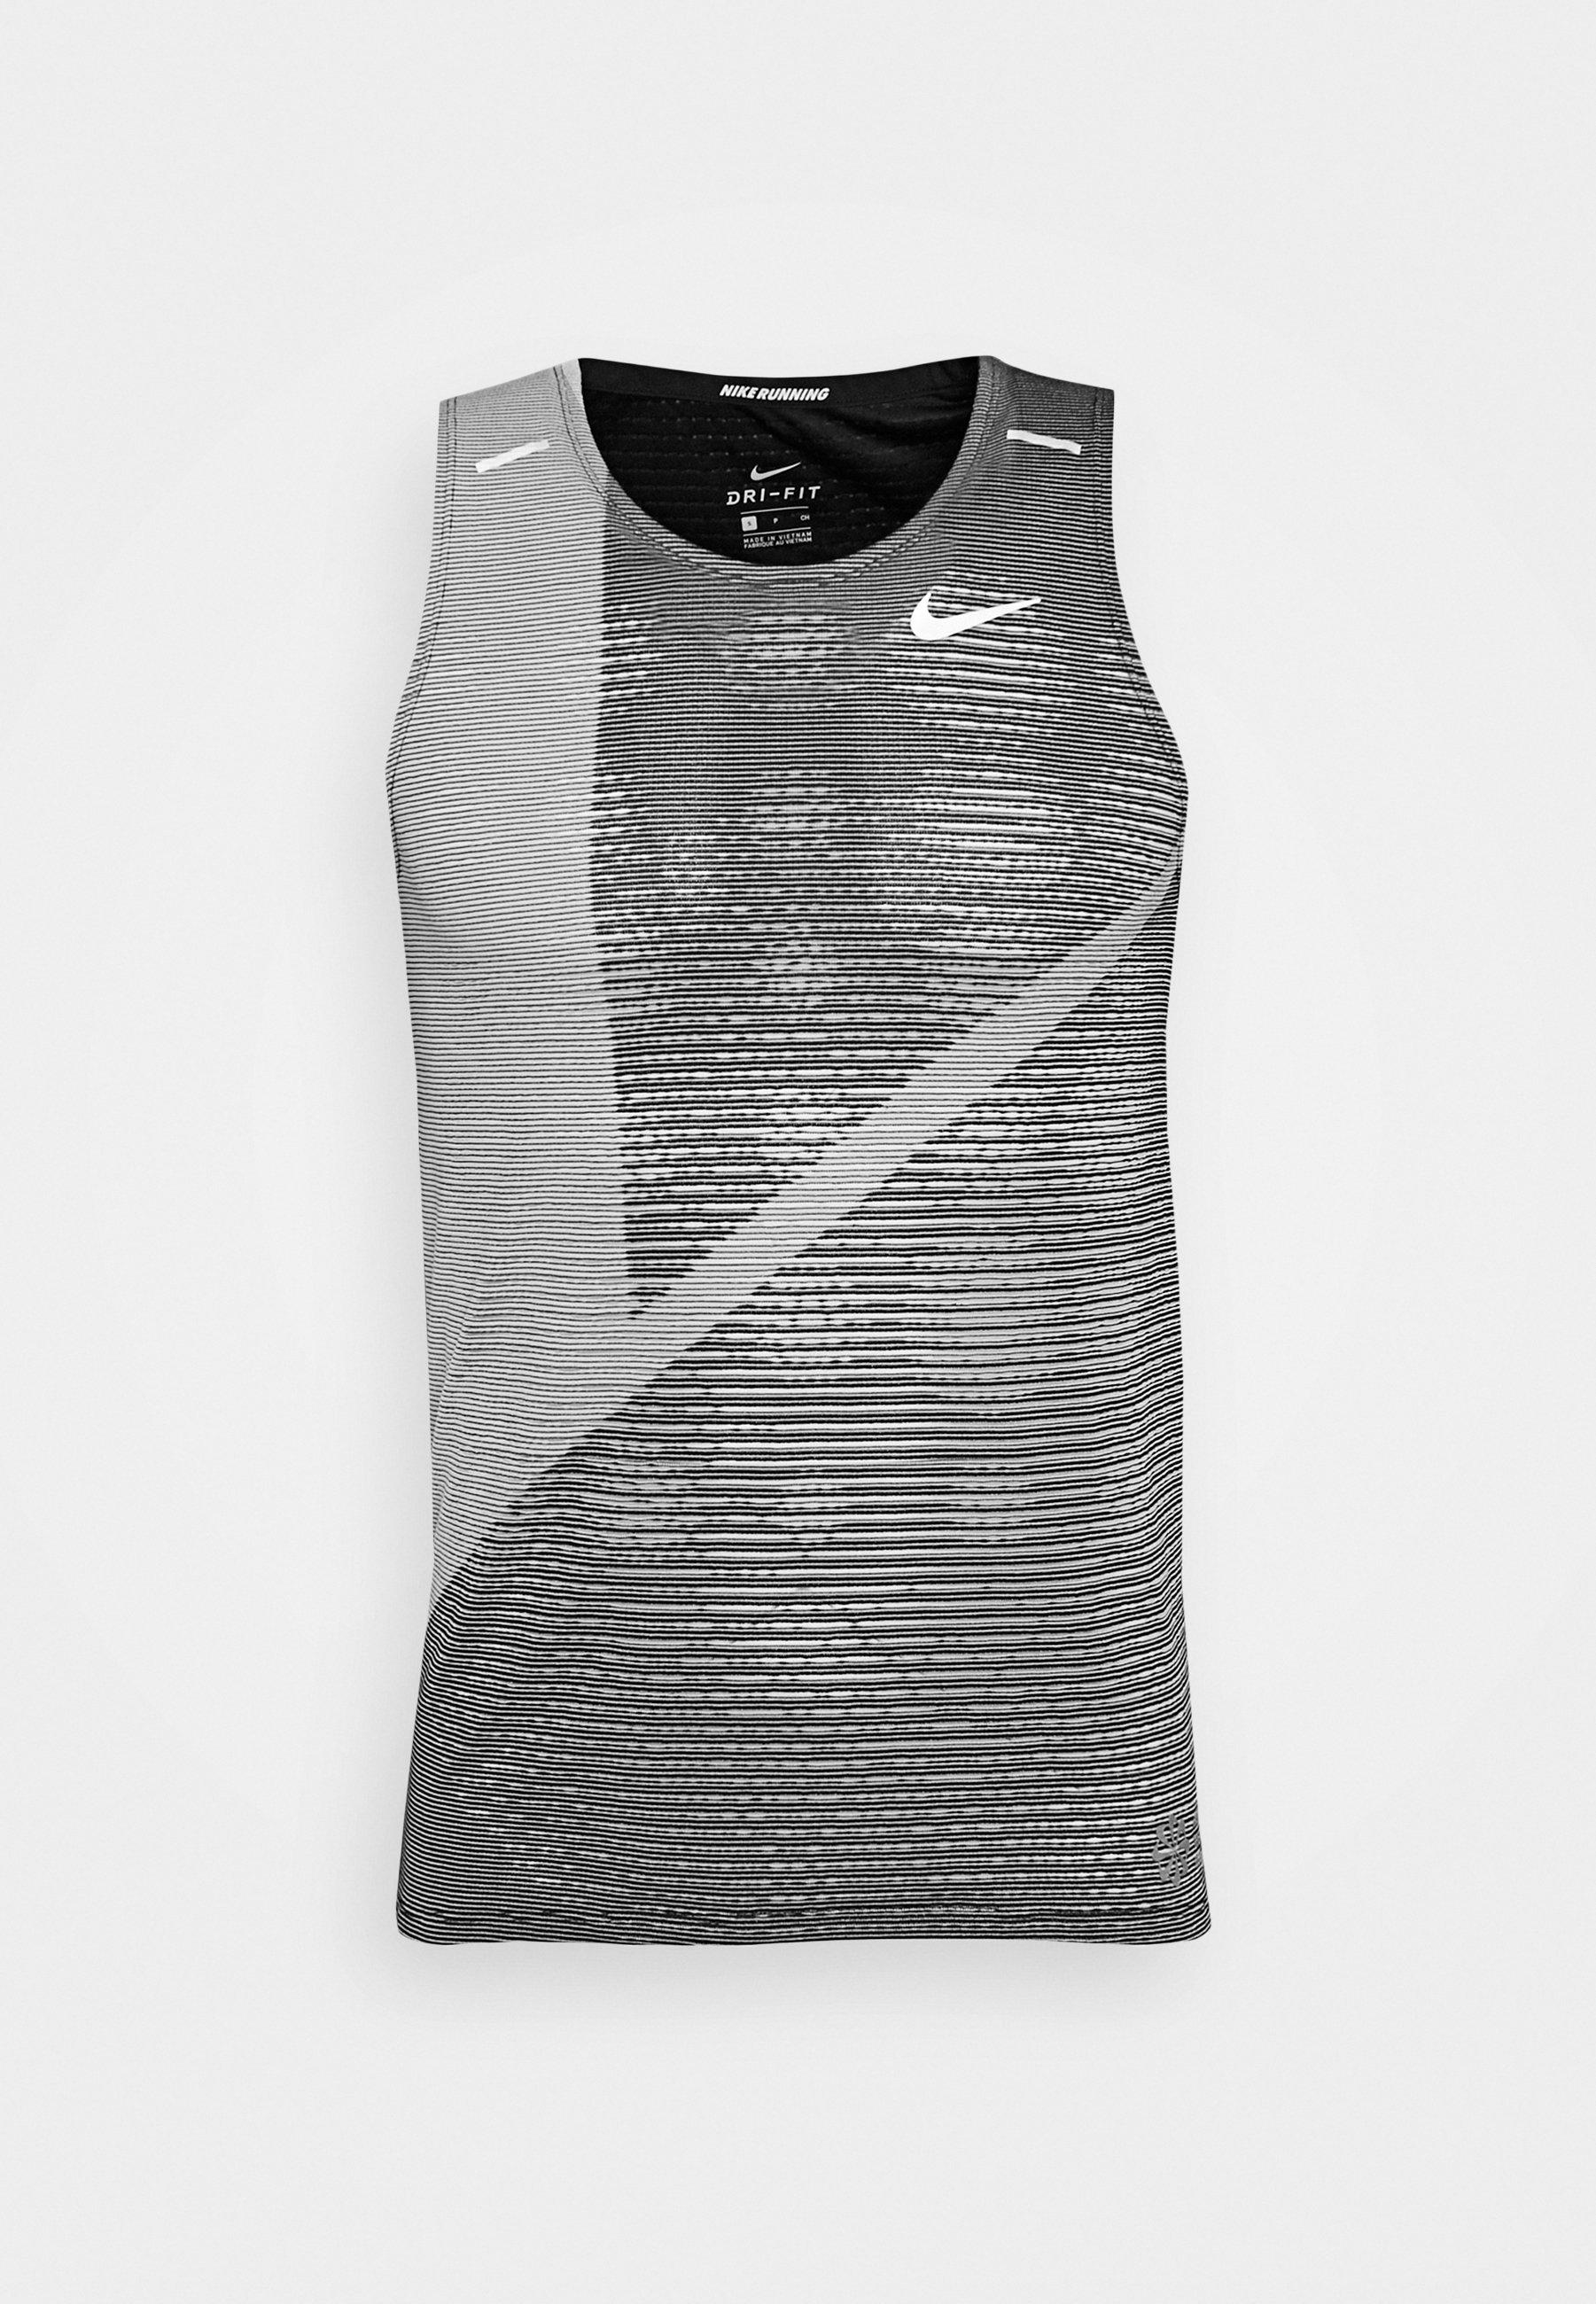 RISE 365 TANK HYBRID T shirt sportiva blackgrey fogsilver